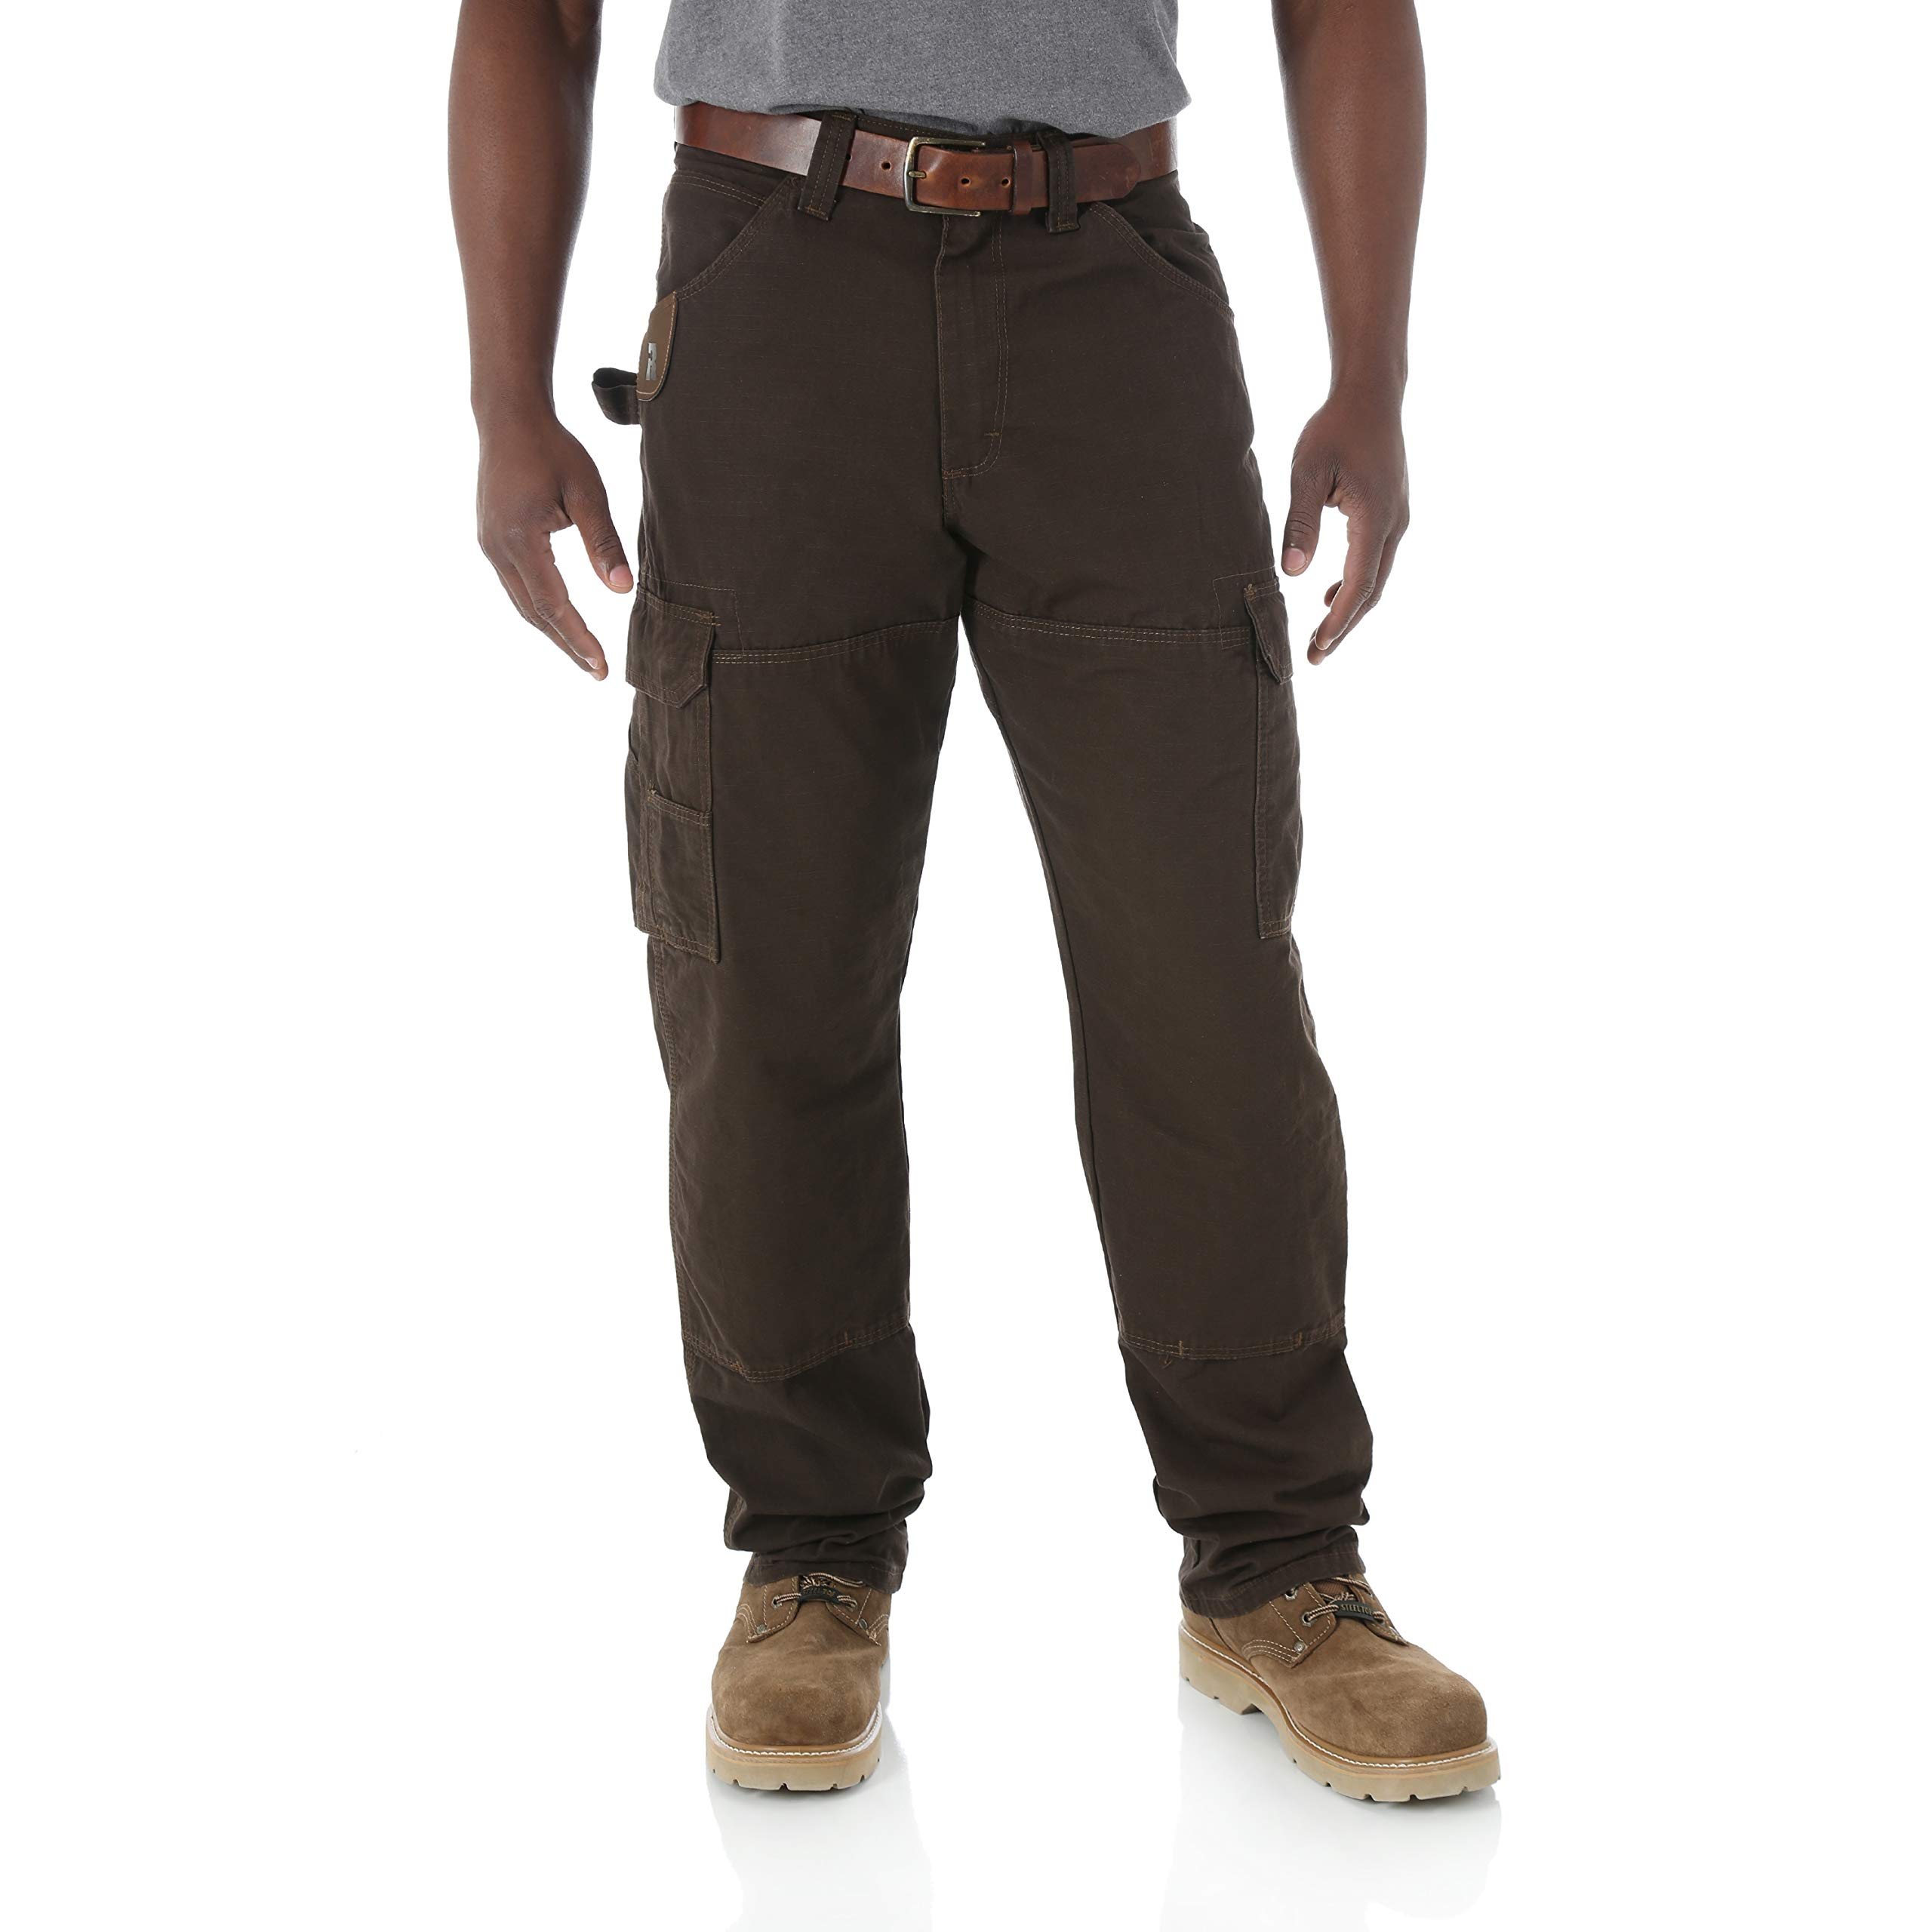 Riggs Workwear by Wrangler Mens Ranger Pant,Dark Brown,40x34